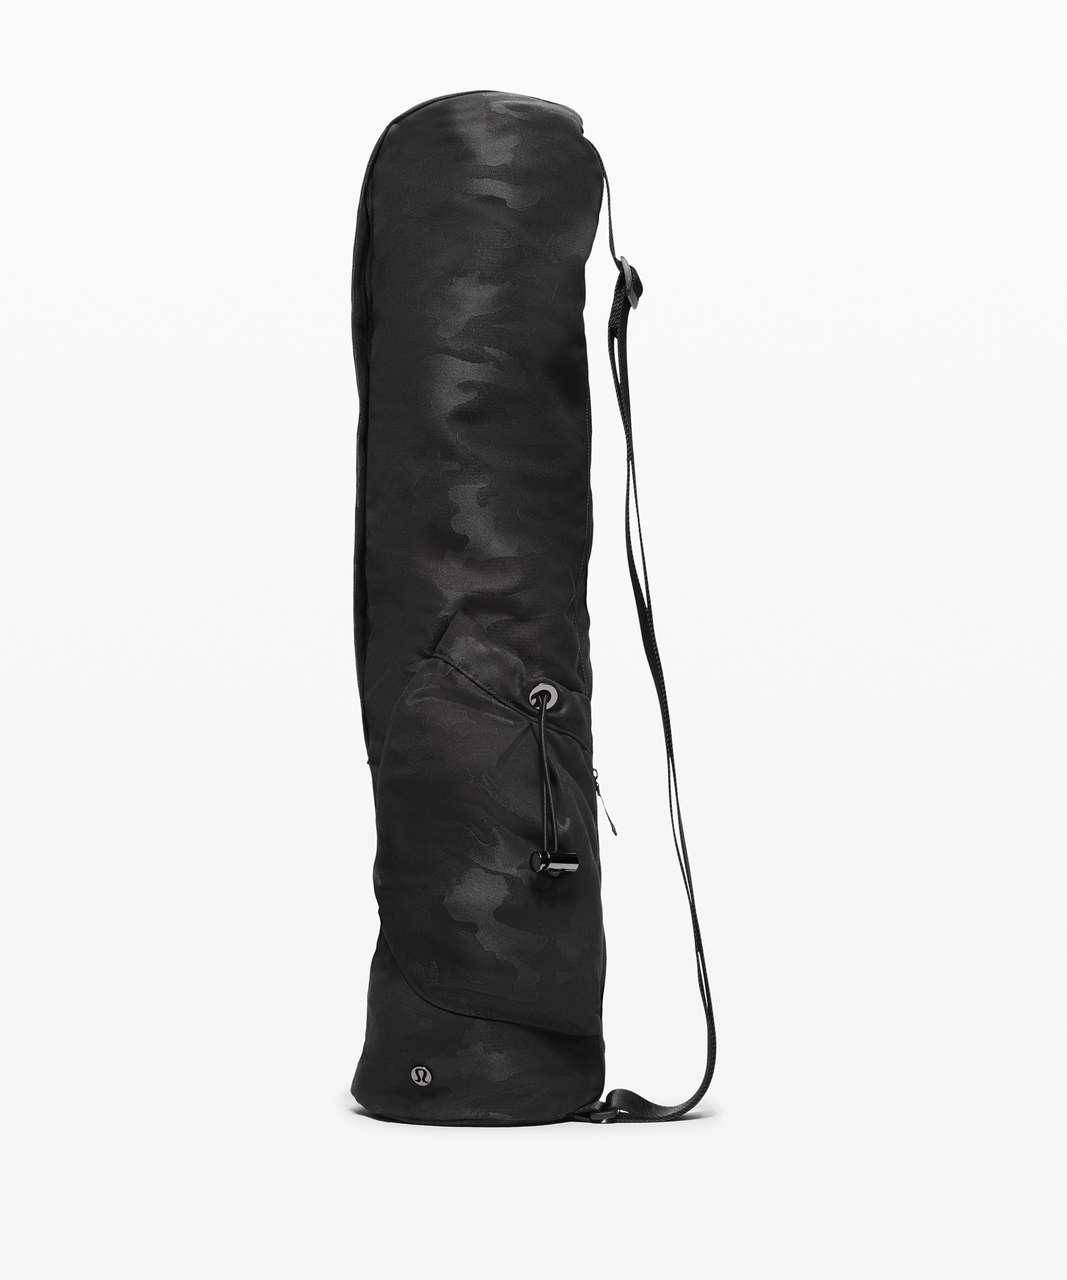 Lululemon The Yoga Mat Bag *16L - Heritage Camo Jacquard Max Black Graphite Grey